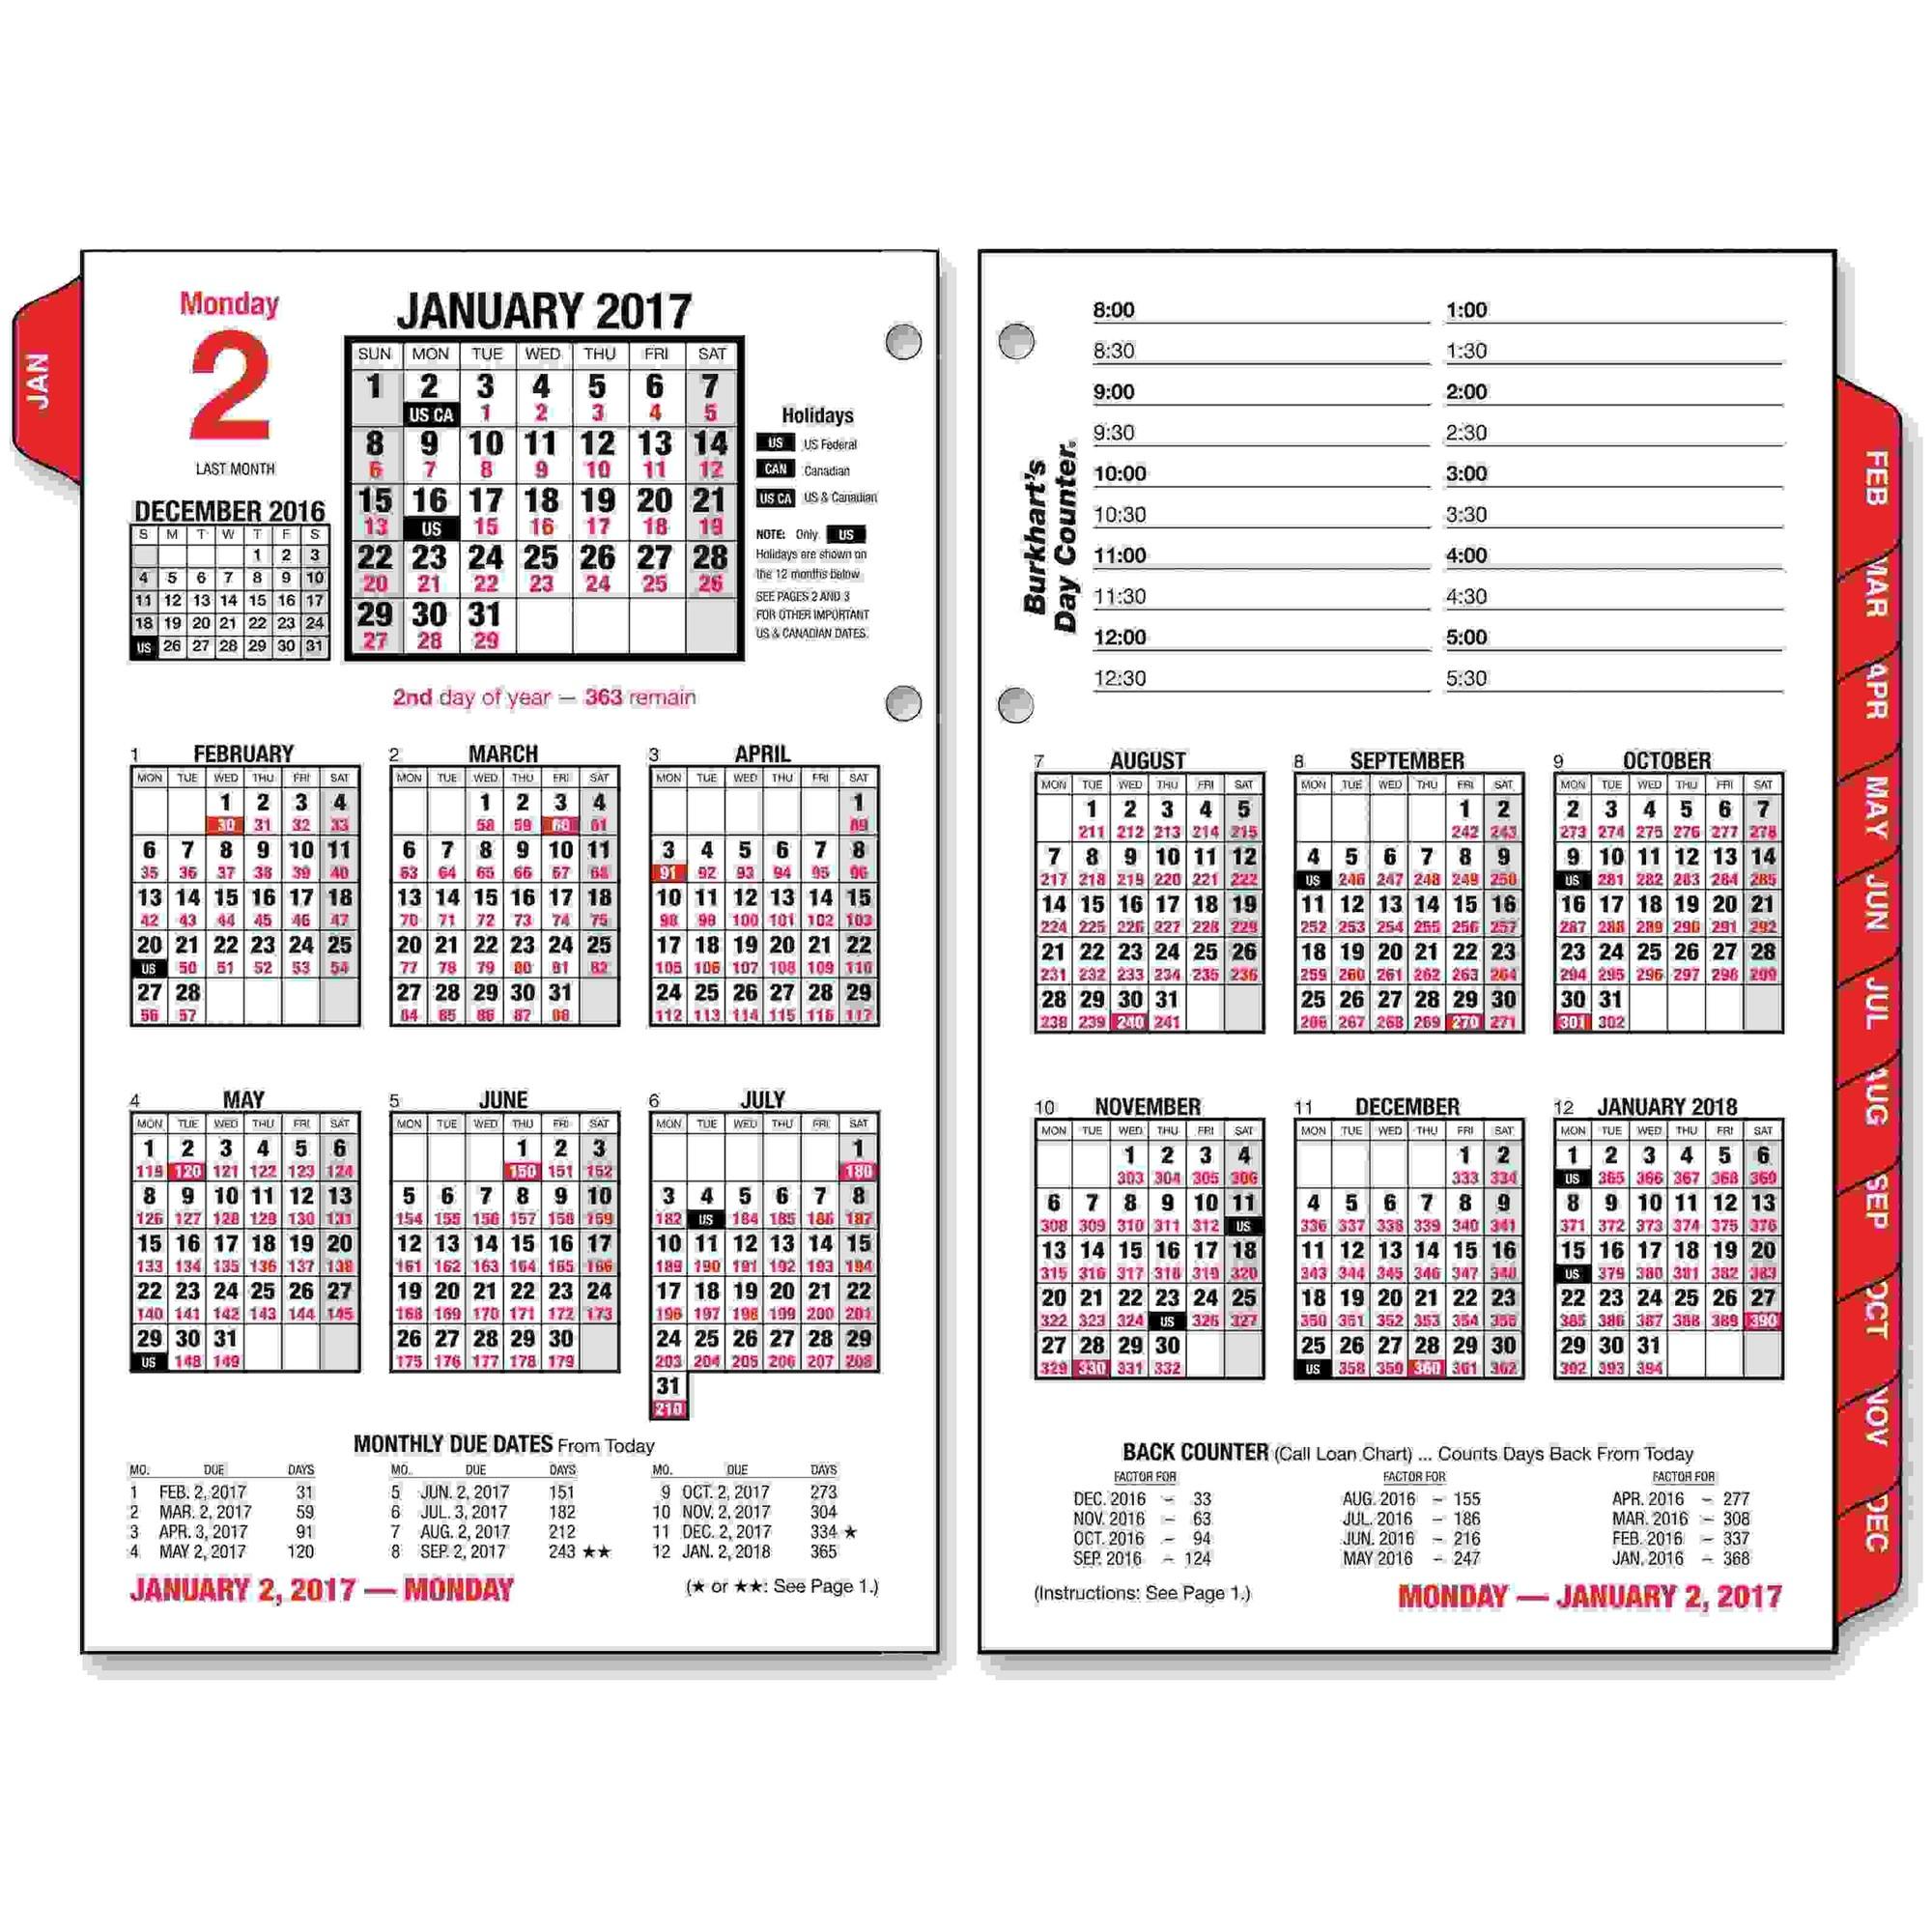 Burkhart's Day Counter Desk Calendar Refill, 4 1/2 x 7 3/8, White, 2017